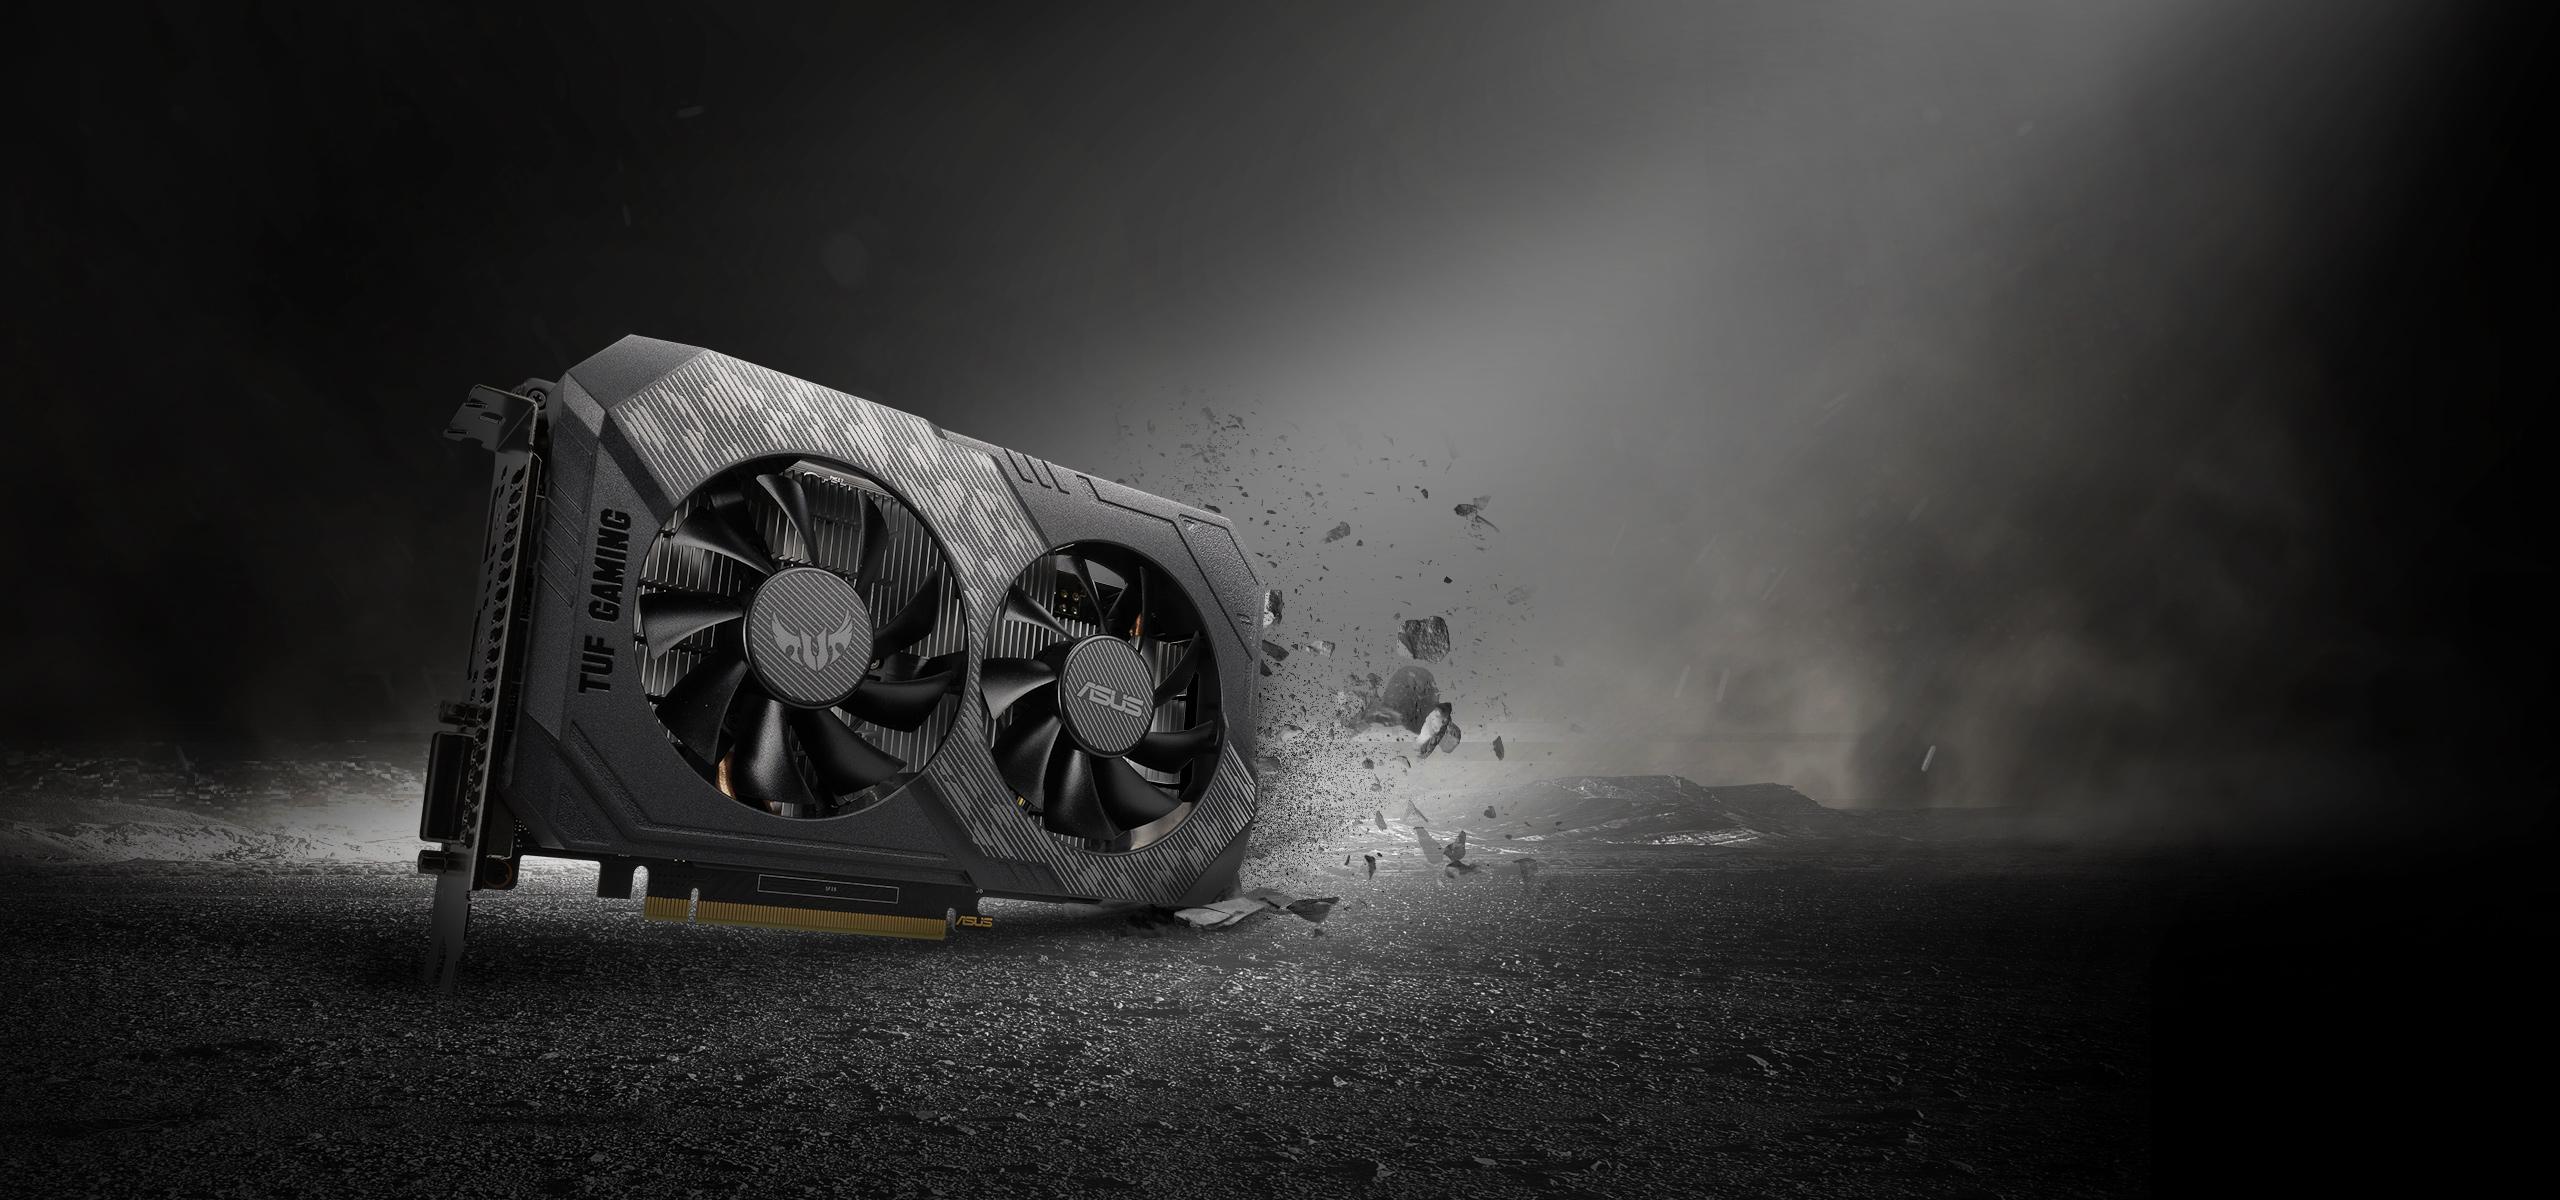 ASUS TUF Gaming GeForce GTX 1650 GDDR6顯示卡具備強大效能、絕佳散熱與強韌耐用等絕佳特點,為硬派玩家不可錯過的裝備首選。